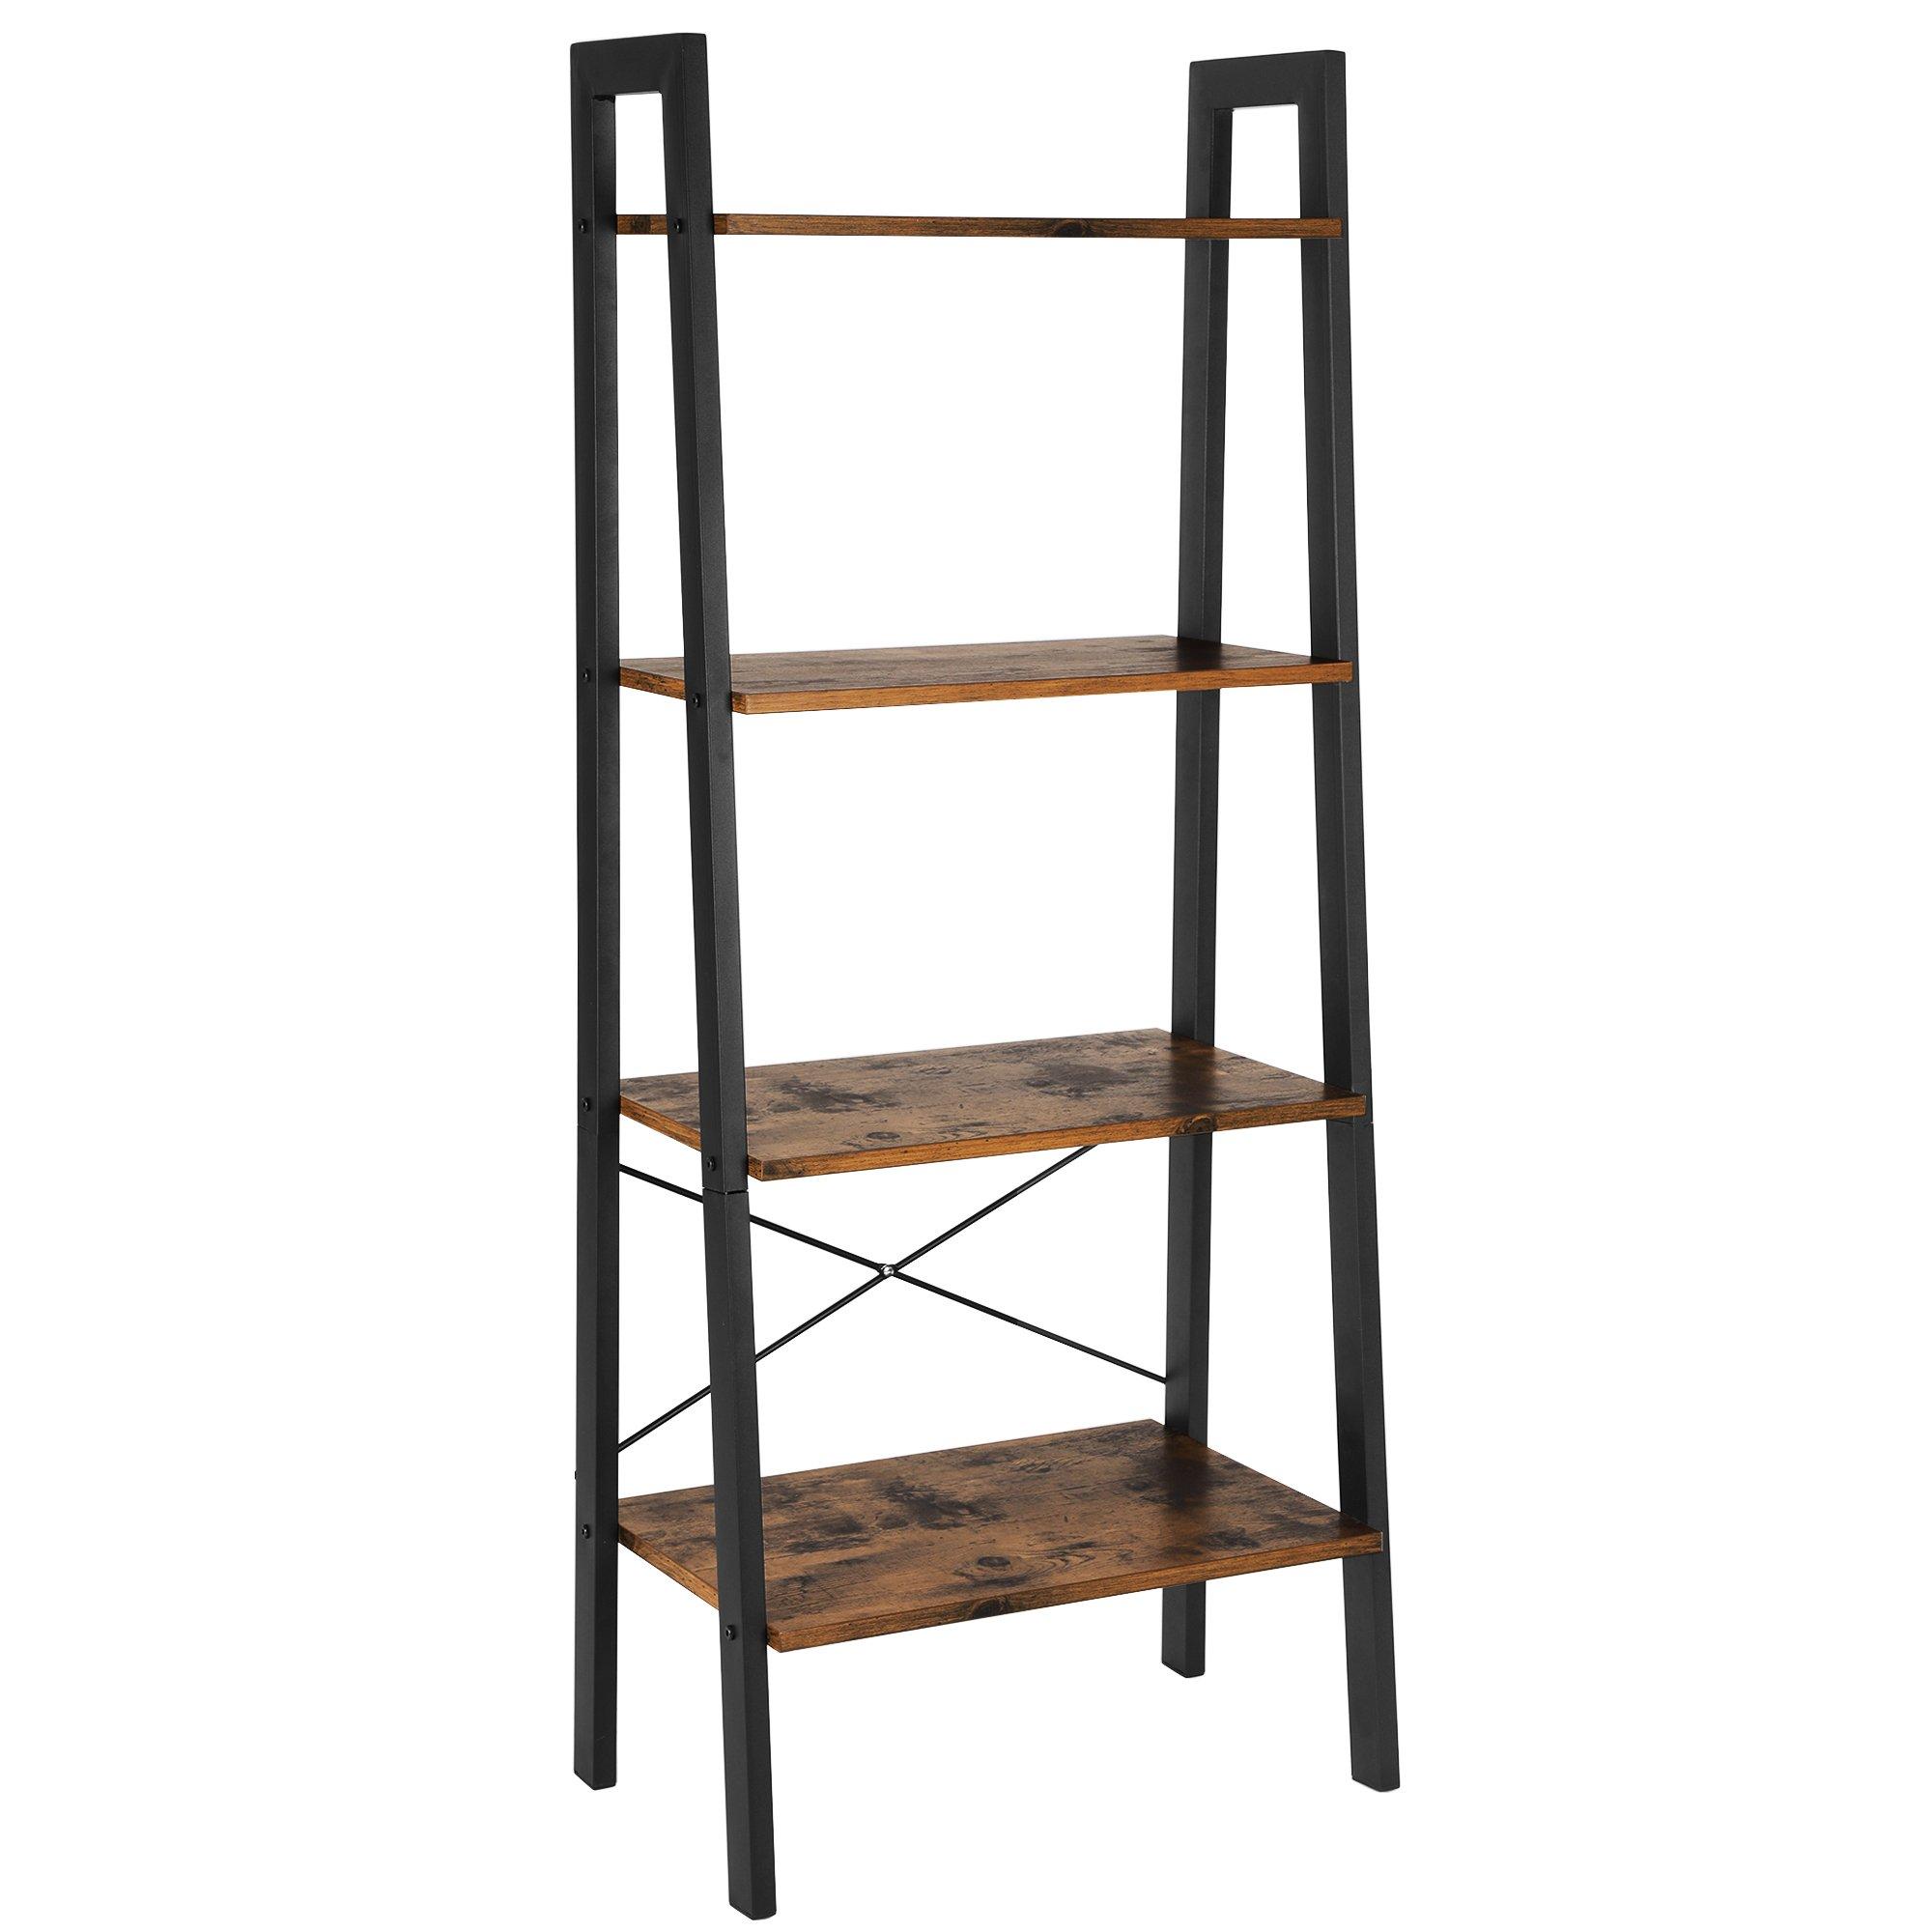 VASAGLE Industrial Ladder Shelf, 4-Tier Bookshelf, Storage Rack Shelves, Bathroom, Living Room, Wood Look Accent Furniture, Metal Frame, Rustic Brown ULLS44X by VASAGLE